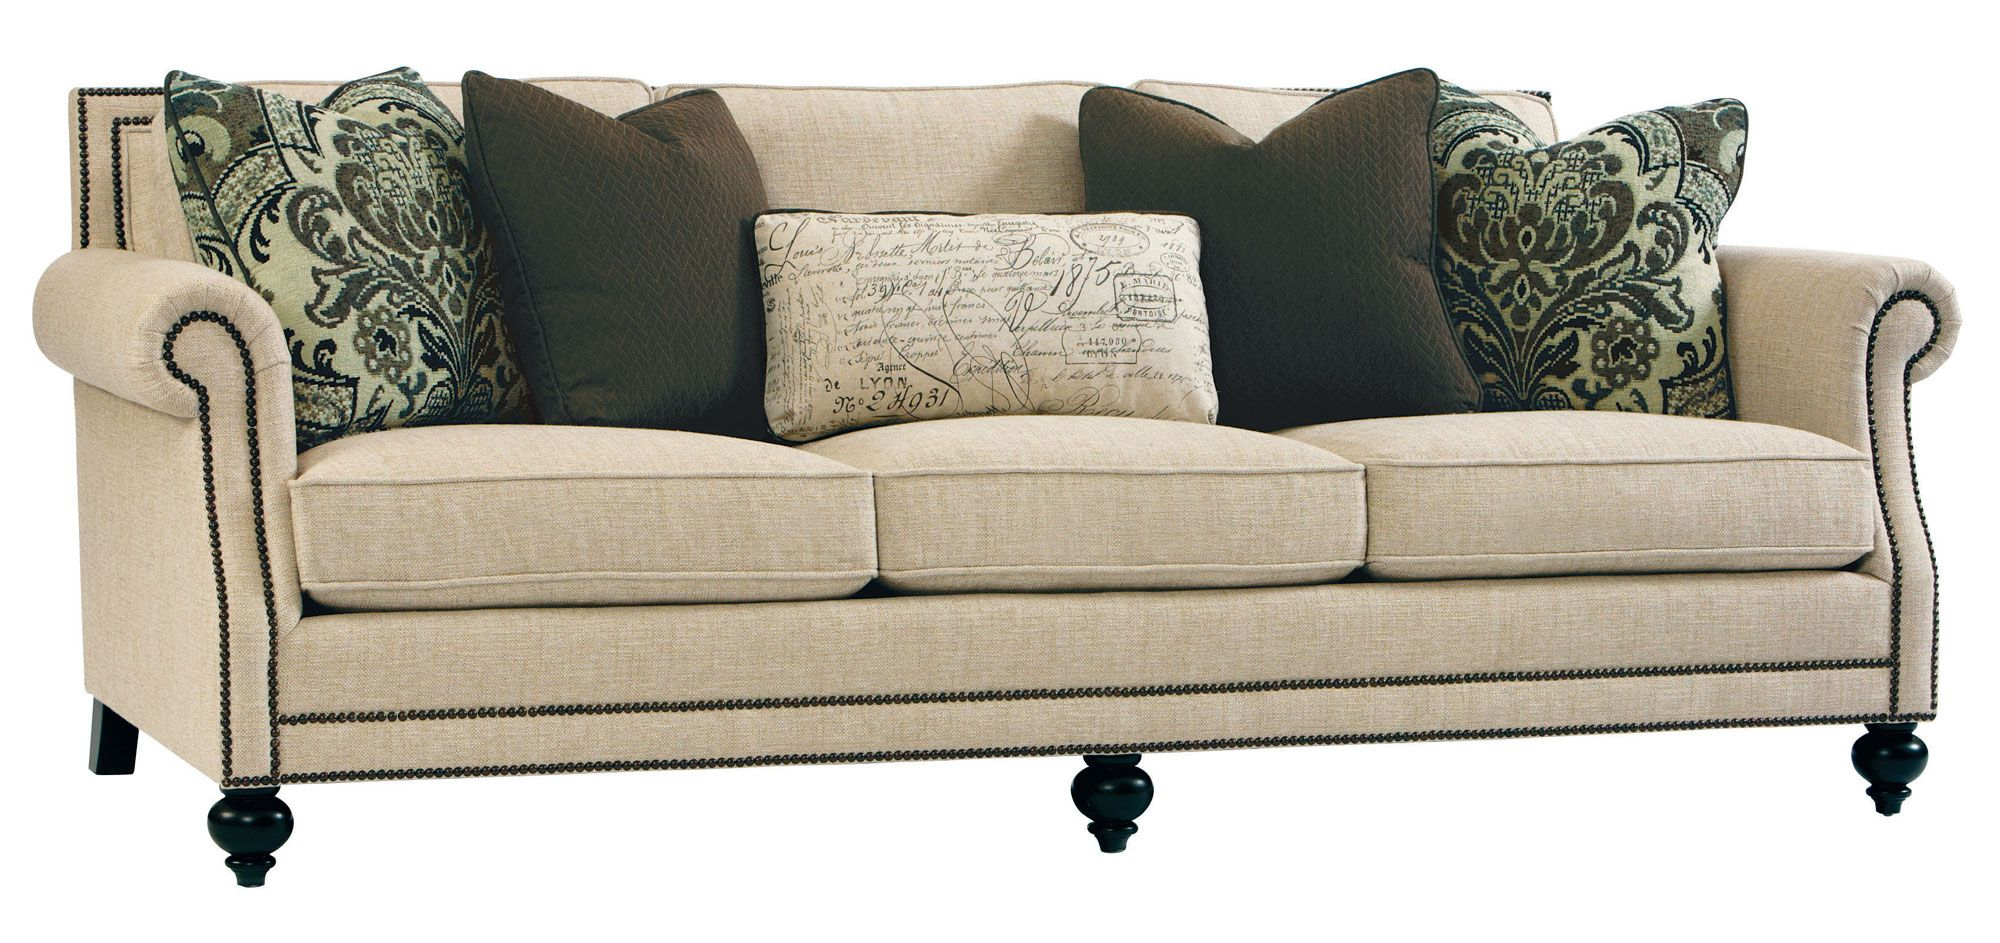 Bernhardt Brae Sofa B6717 Traditional Sofa Upholstered Sofa